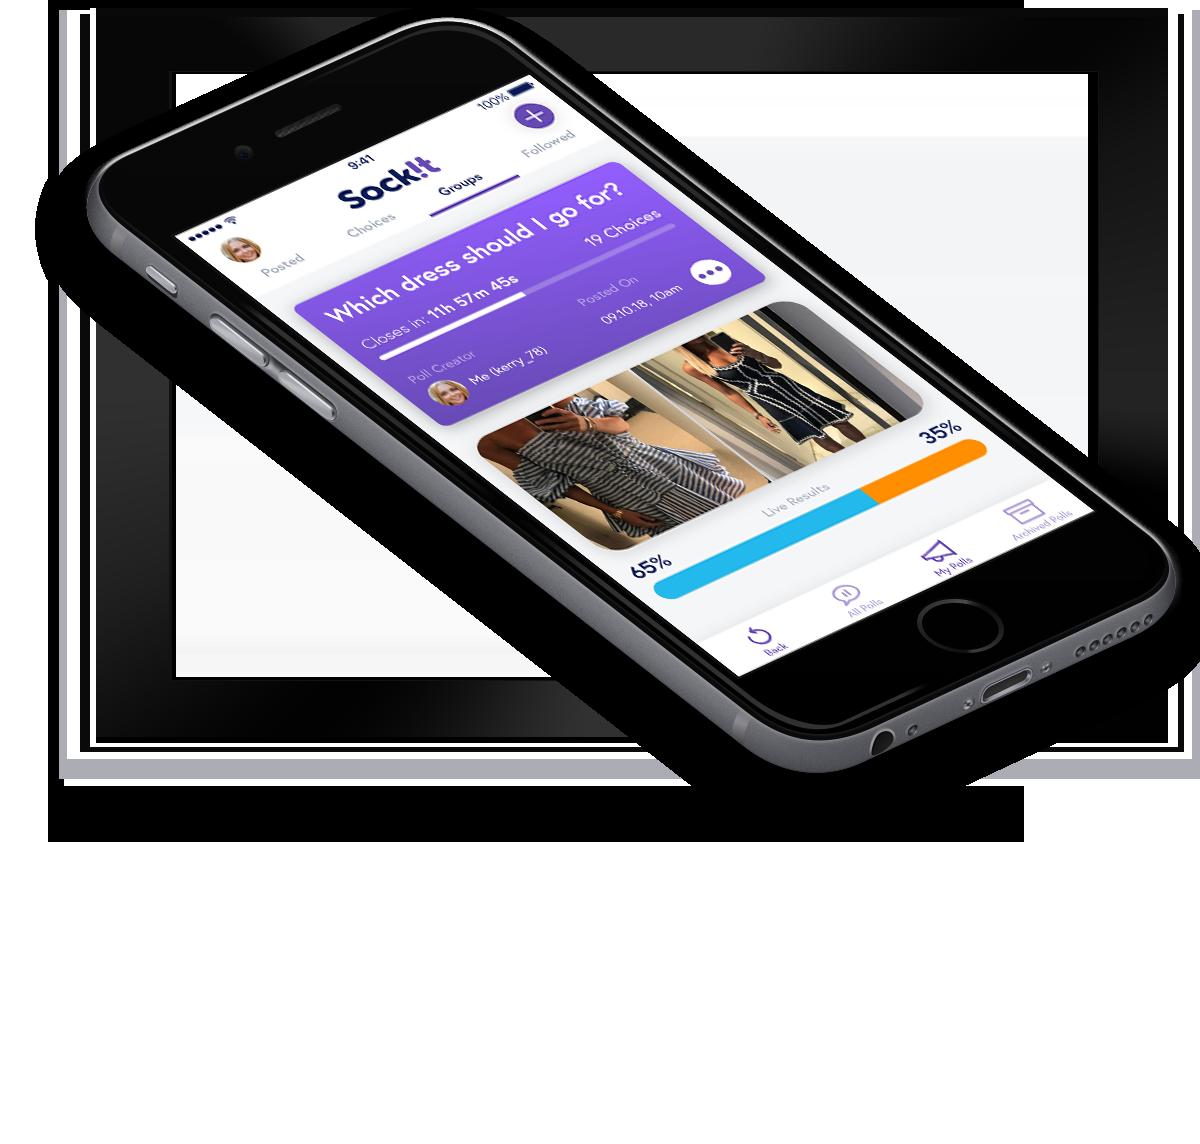 Sockit homepage on mobile